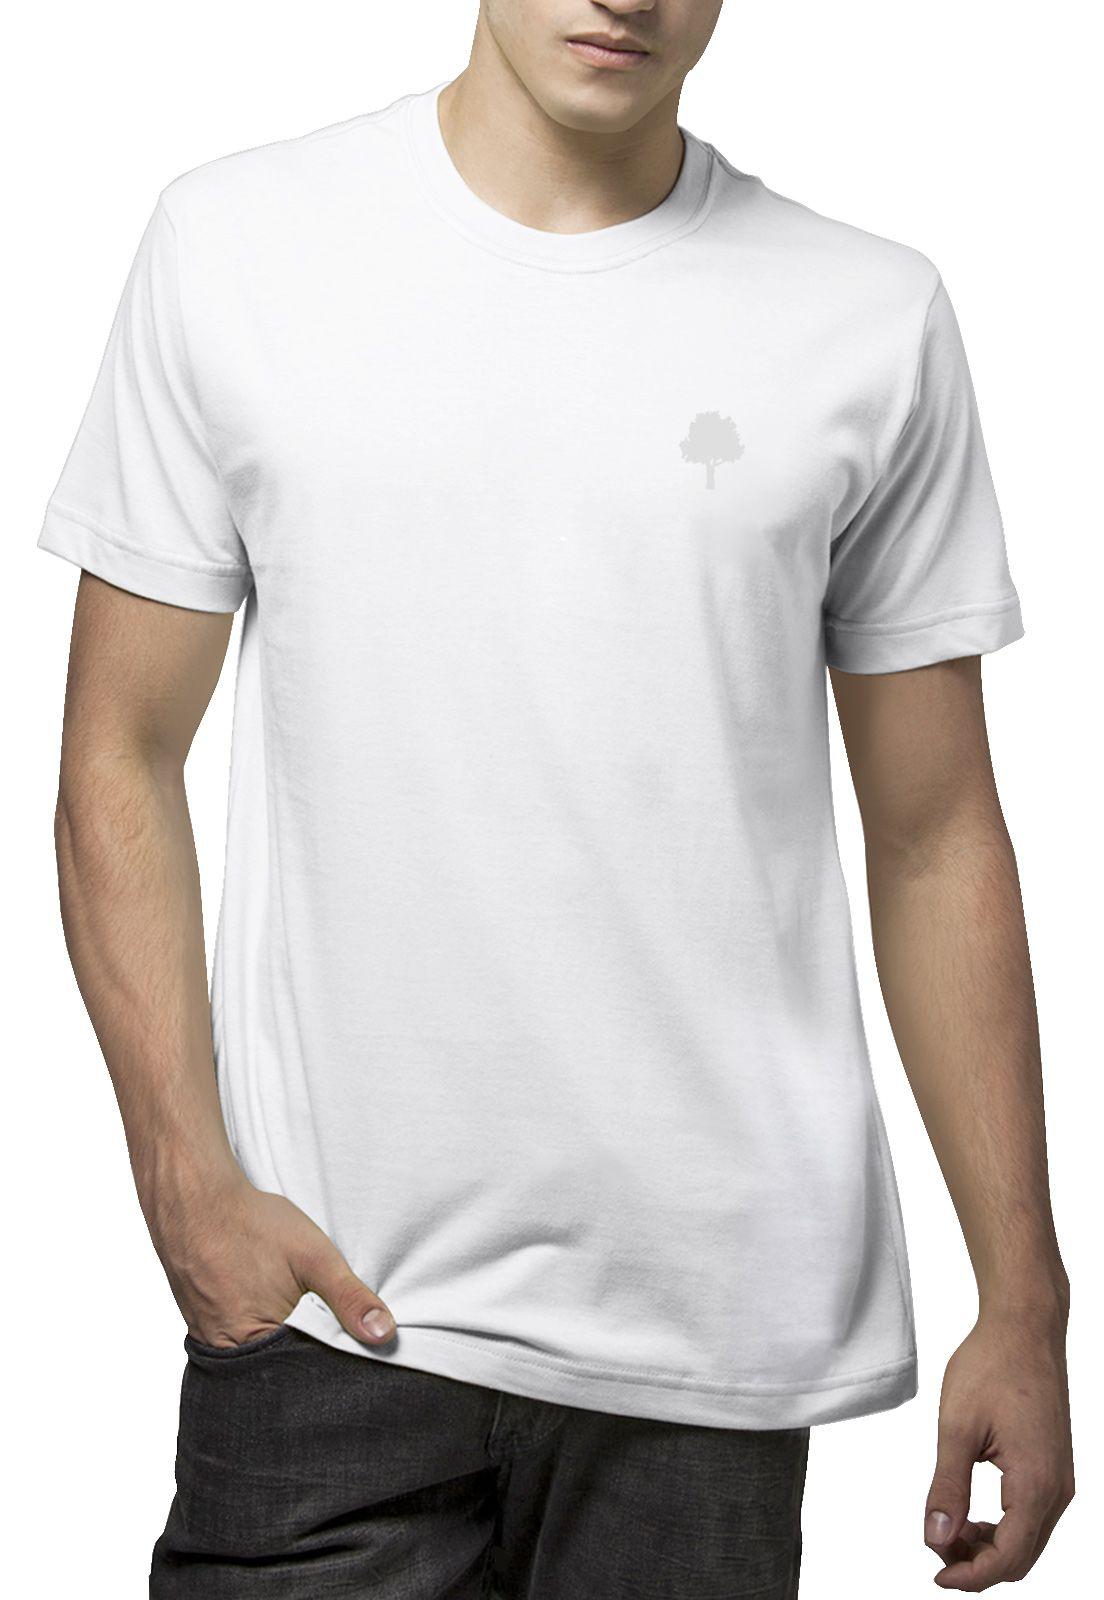 Camiseta Amazônia Básica Árvore Bordada - Branco